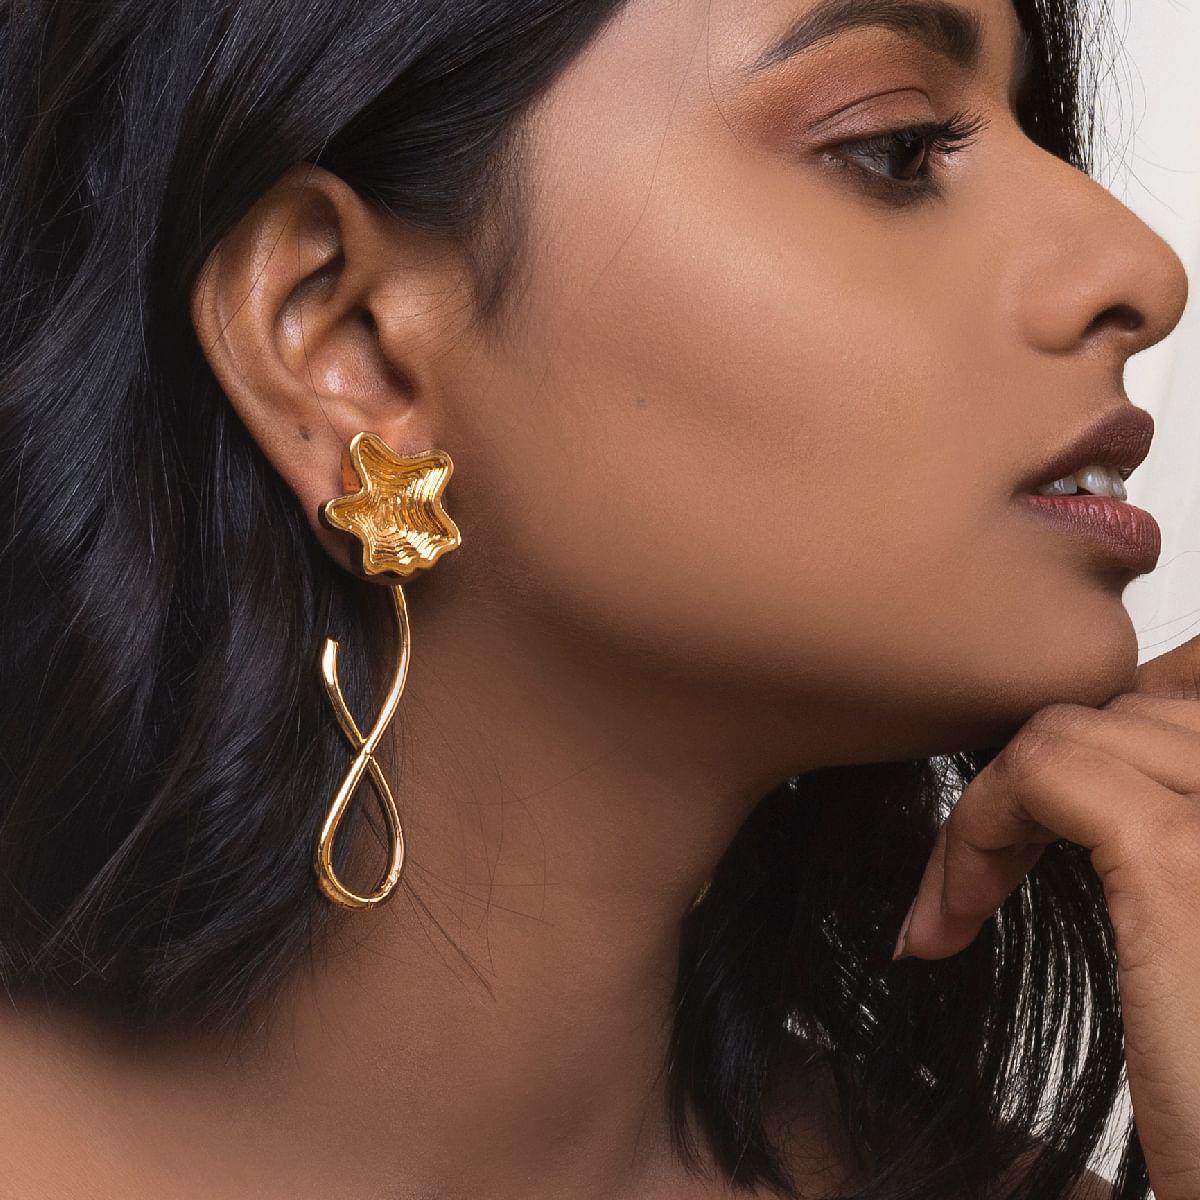 Curvy layered Stud Earrings